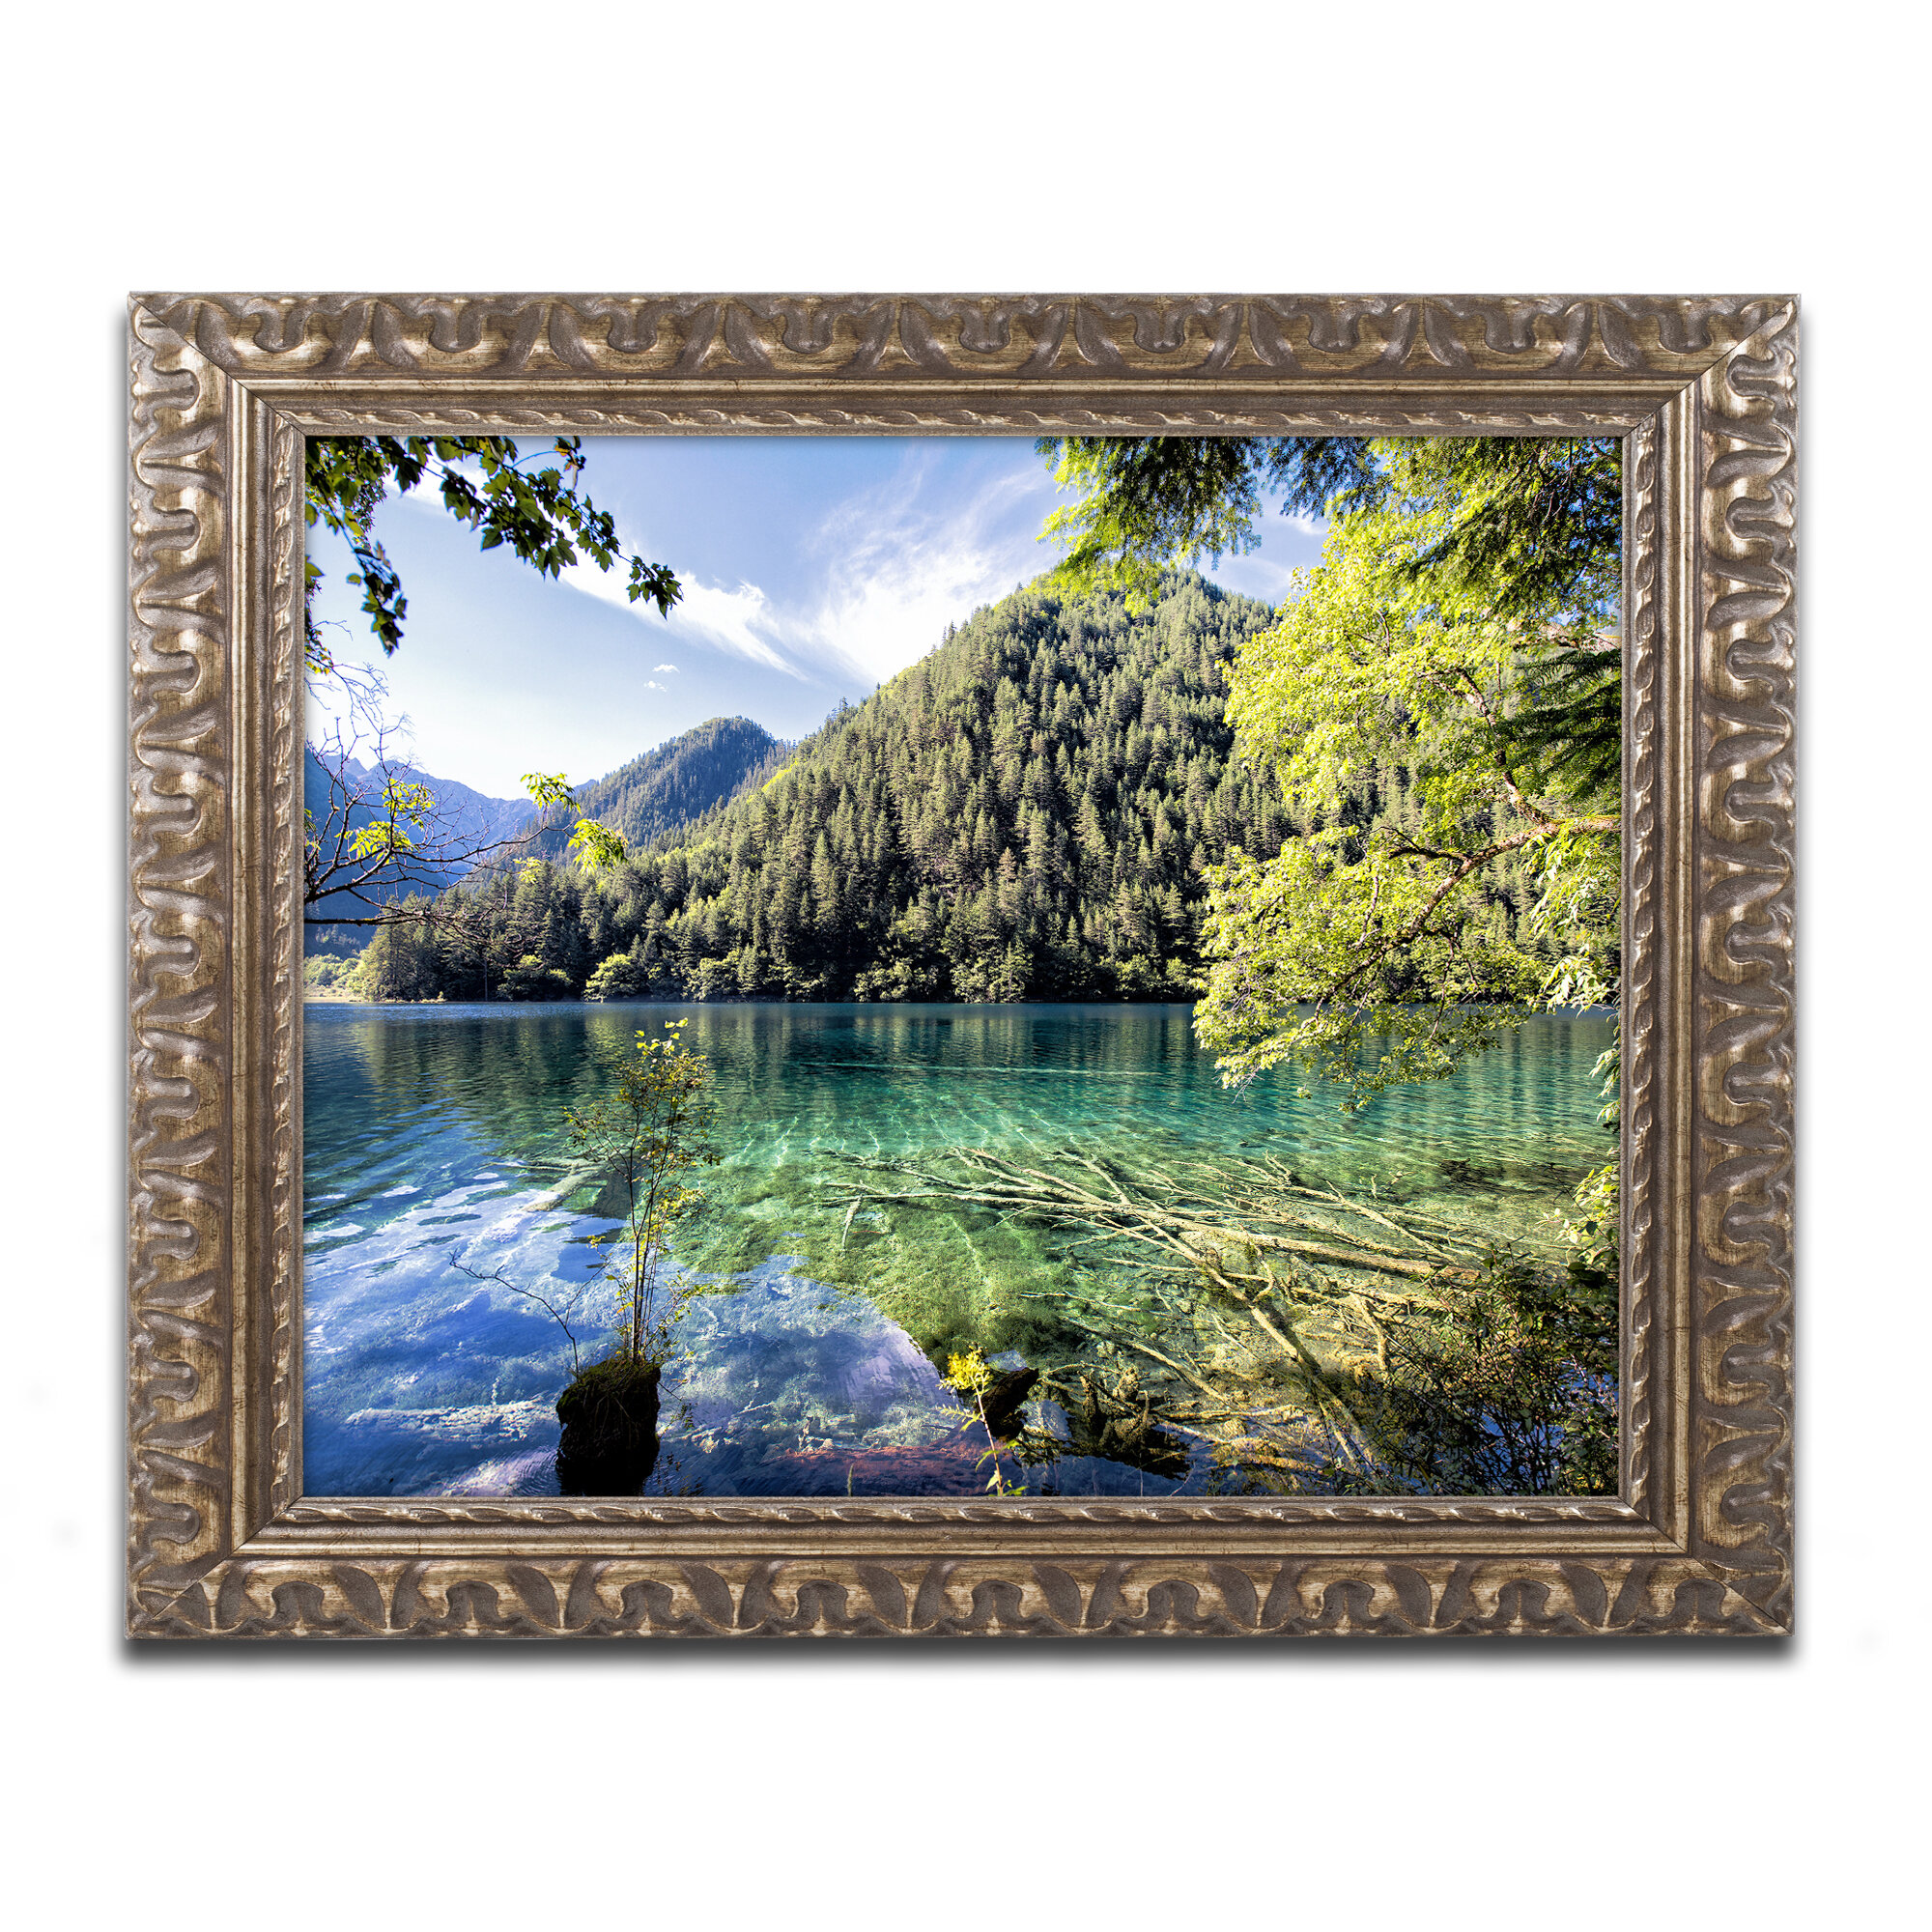 Trademark Art Tiger Lake By Philippe Hugonnard Framed Photographic Print Wayfair